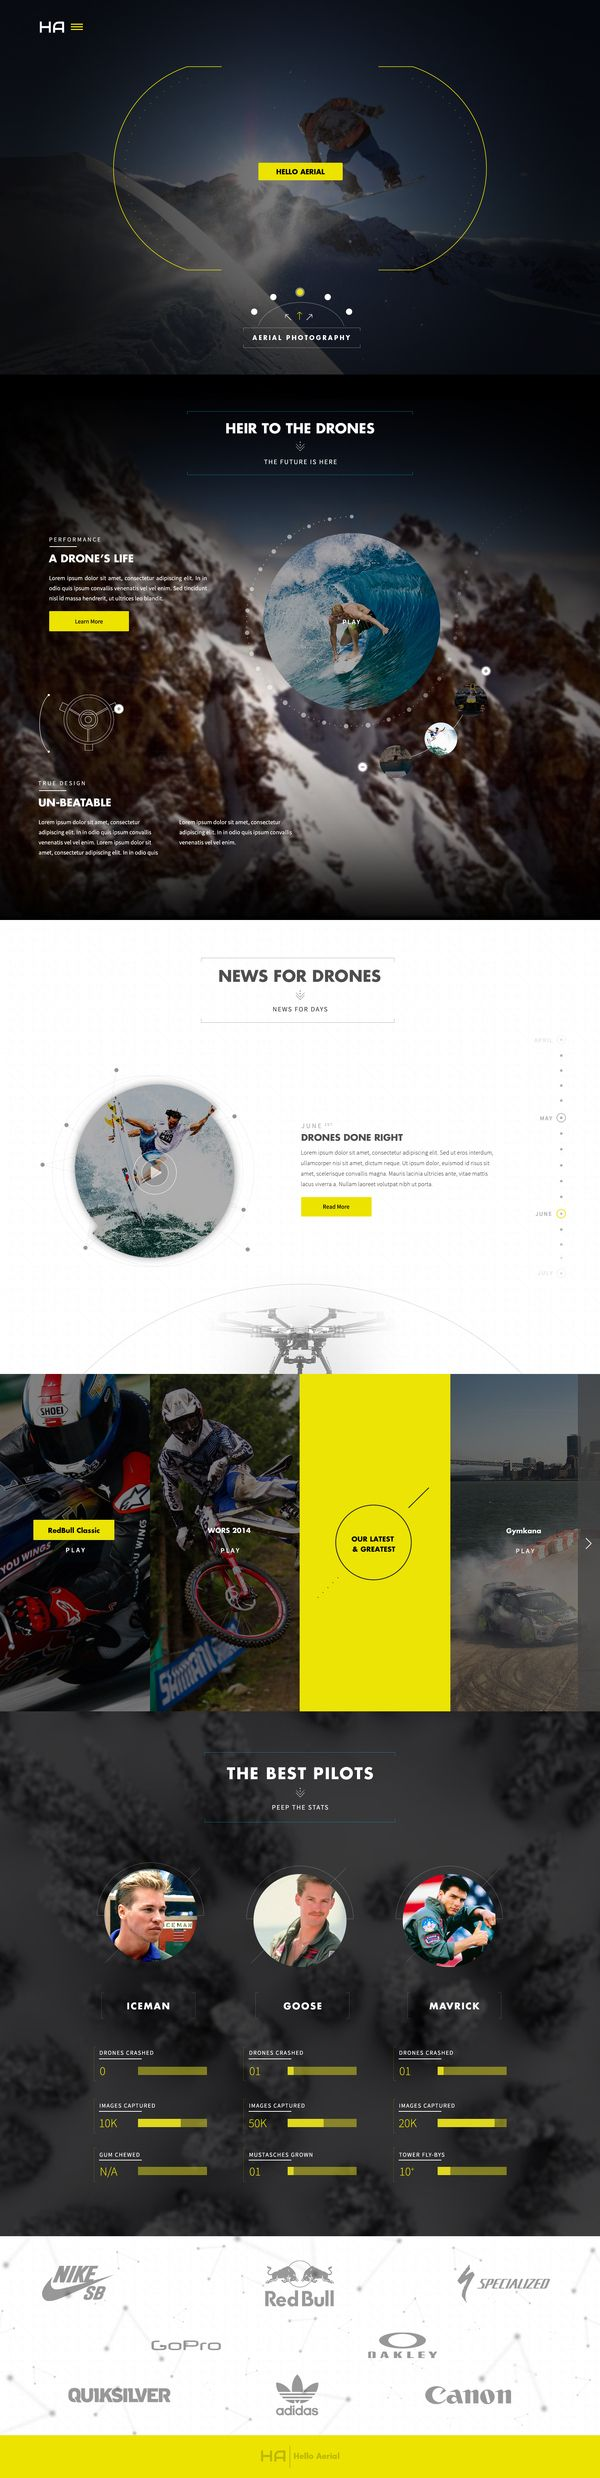 #ResponsiveDesign #Web #UI #UX #WordPress #Resposive Design #Website